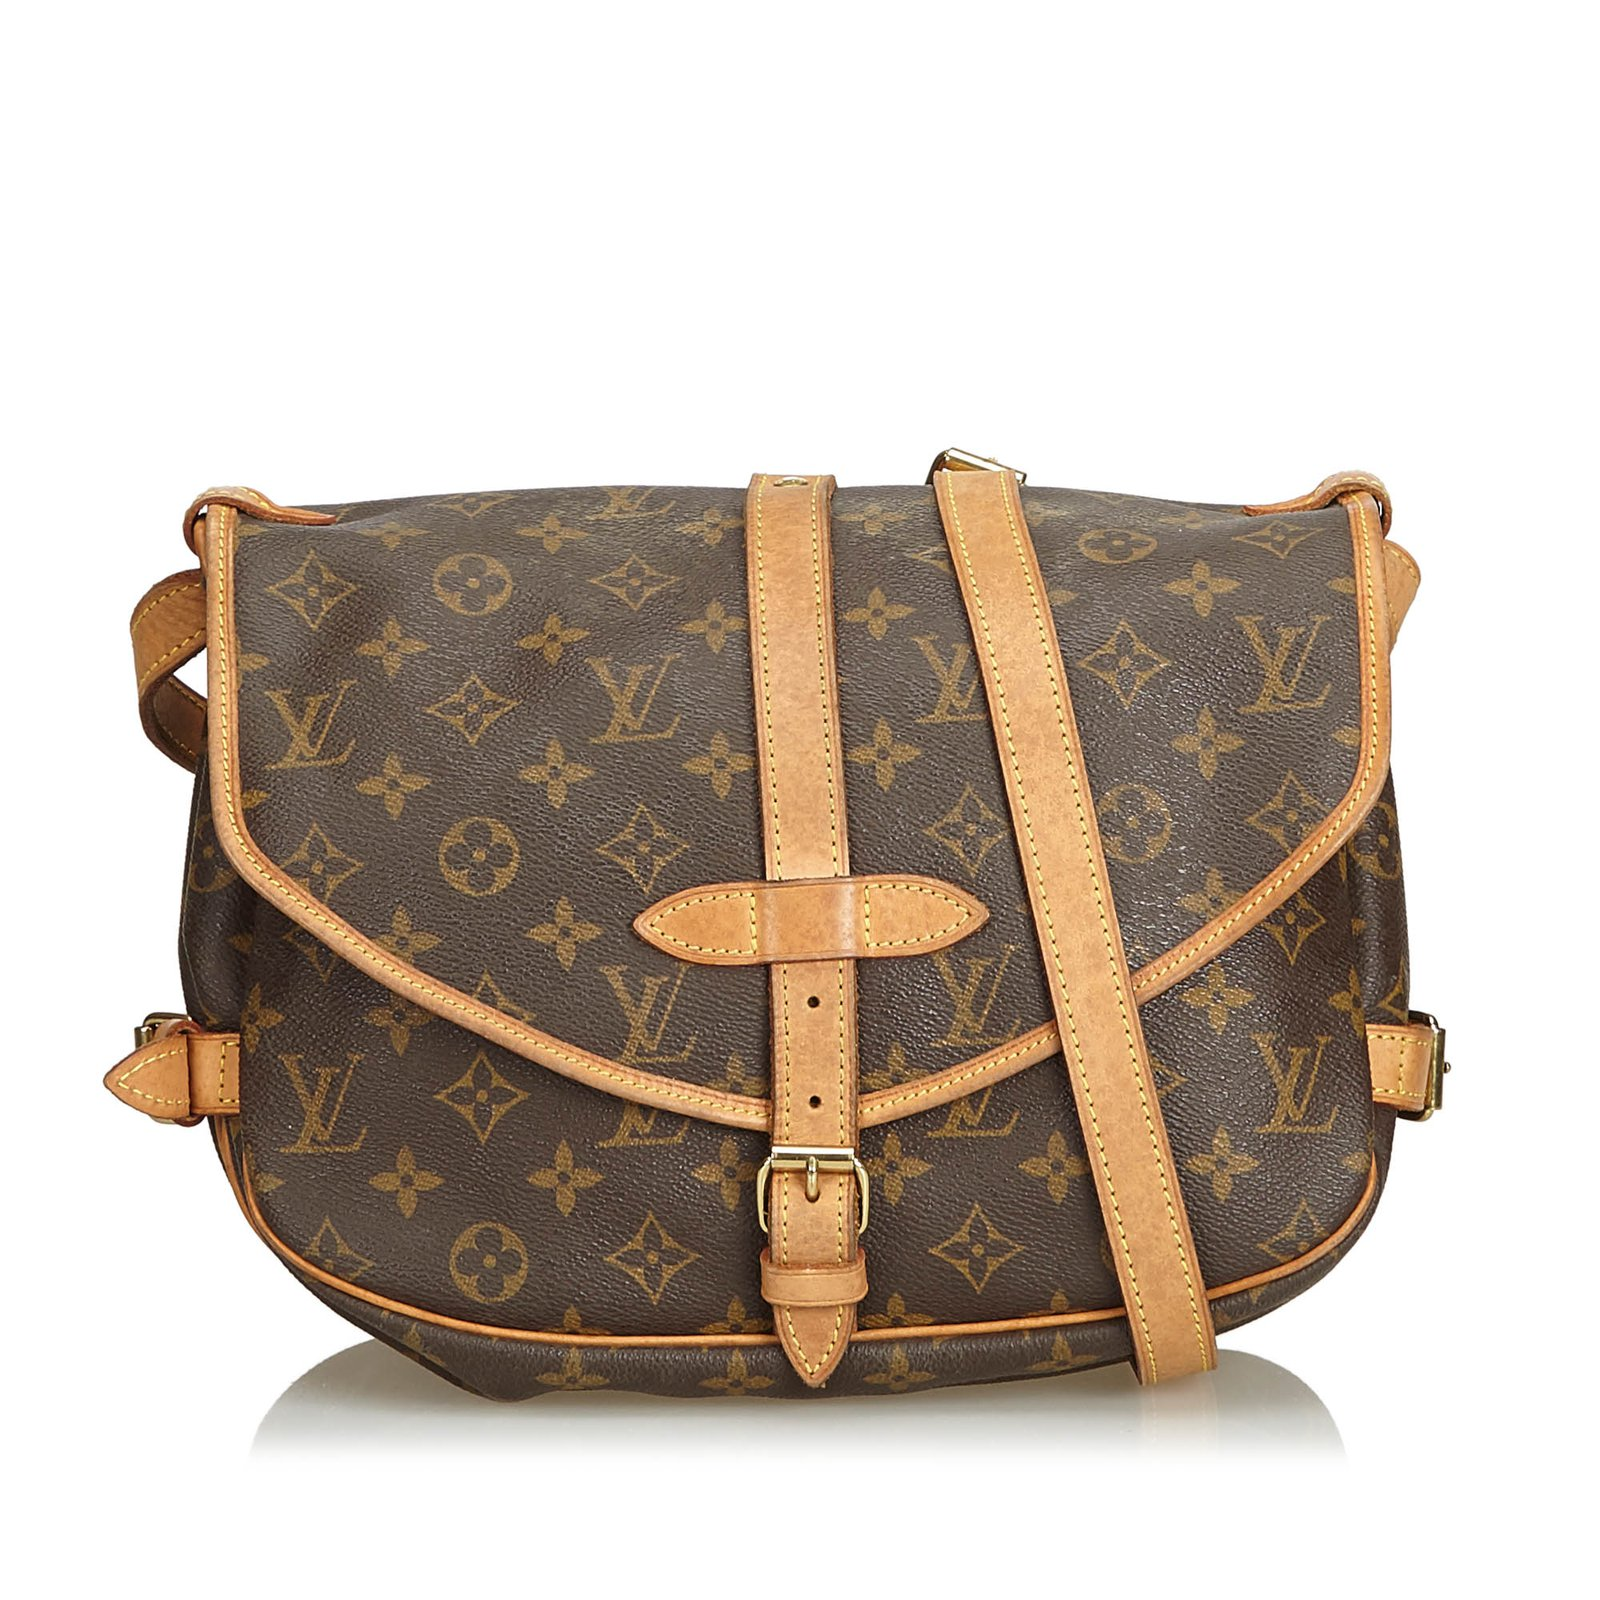 Louis Vuitton Monogram Saumur 30 Handbags Leather 491b321e1